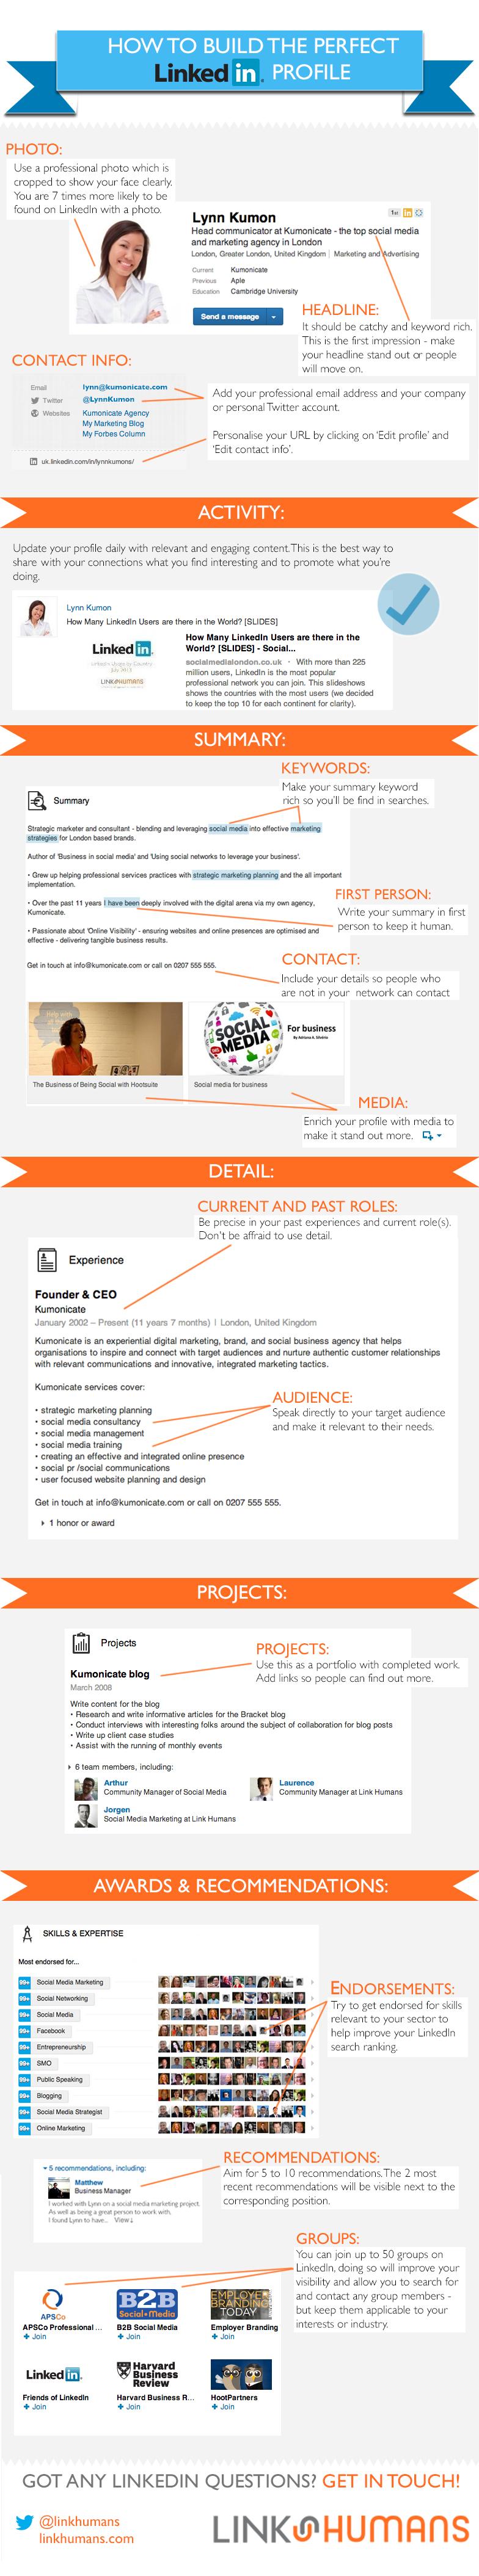 720x3876xlinkedin-infographic1-jpg-pagespeed-ic-tyfkpmhwbx